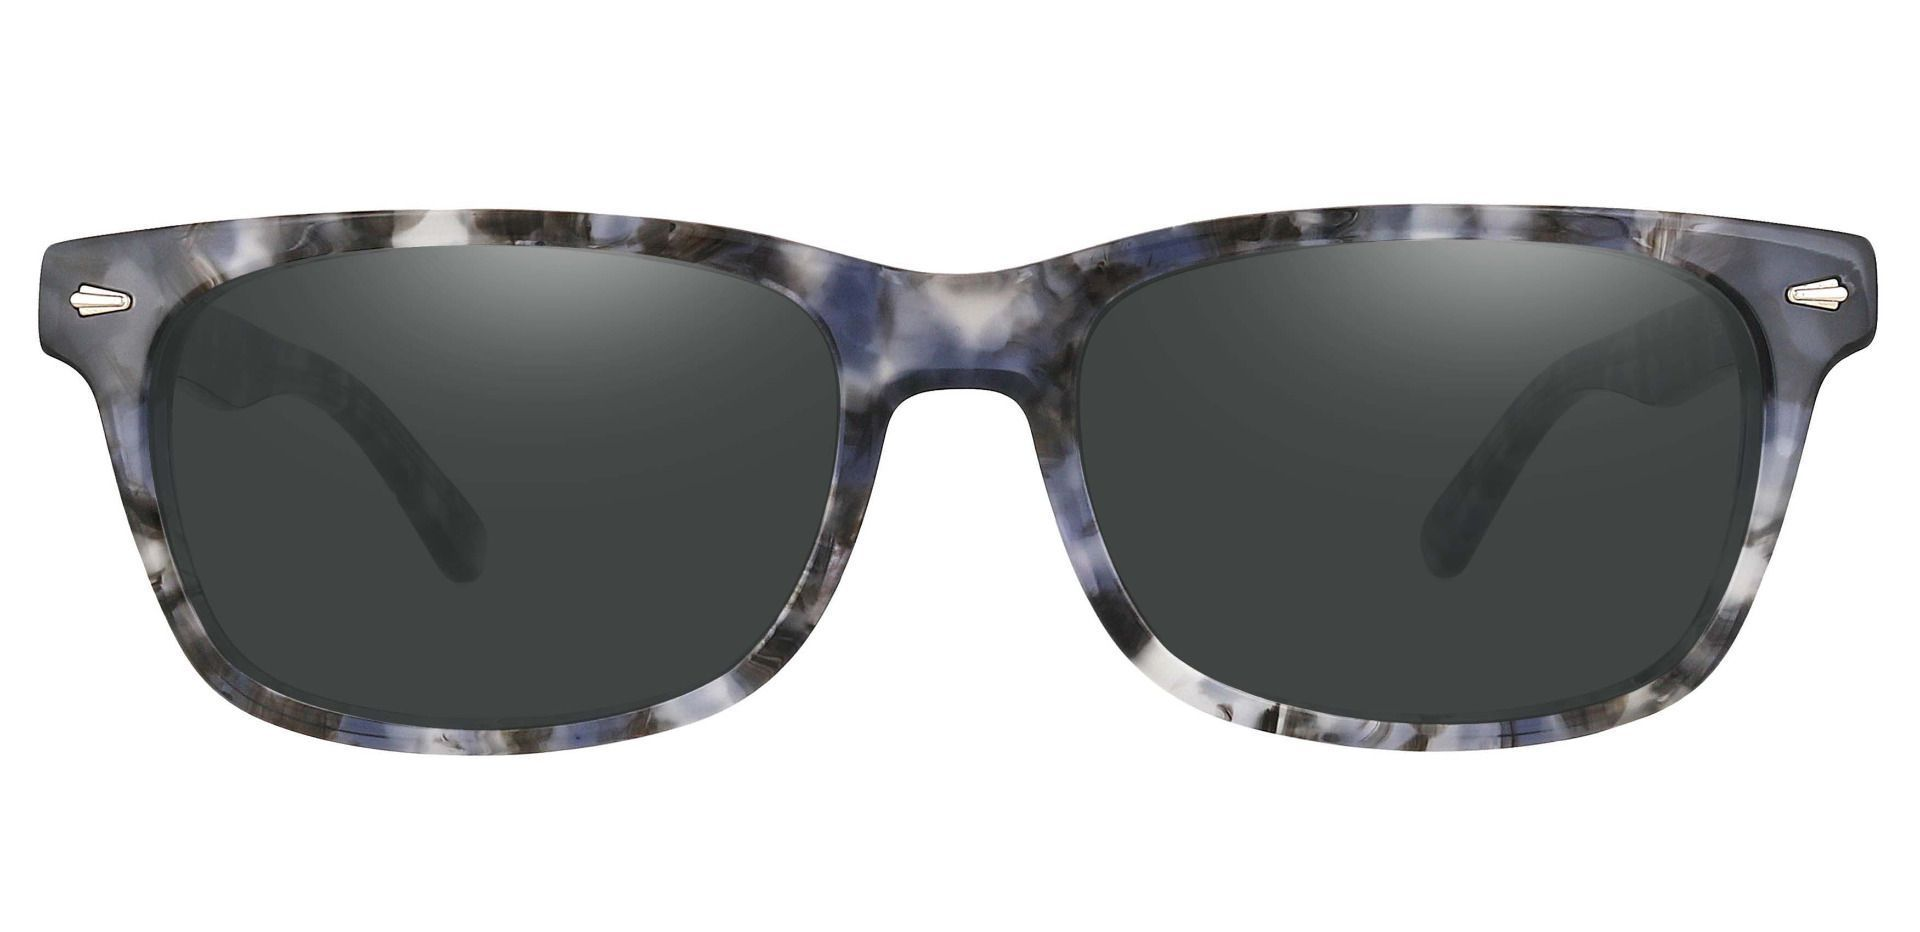 Hendrix Rectangle Progressive Sunglasses - Floral Frame With Gray Lenses